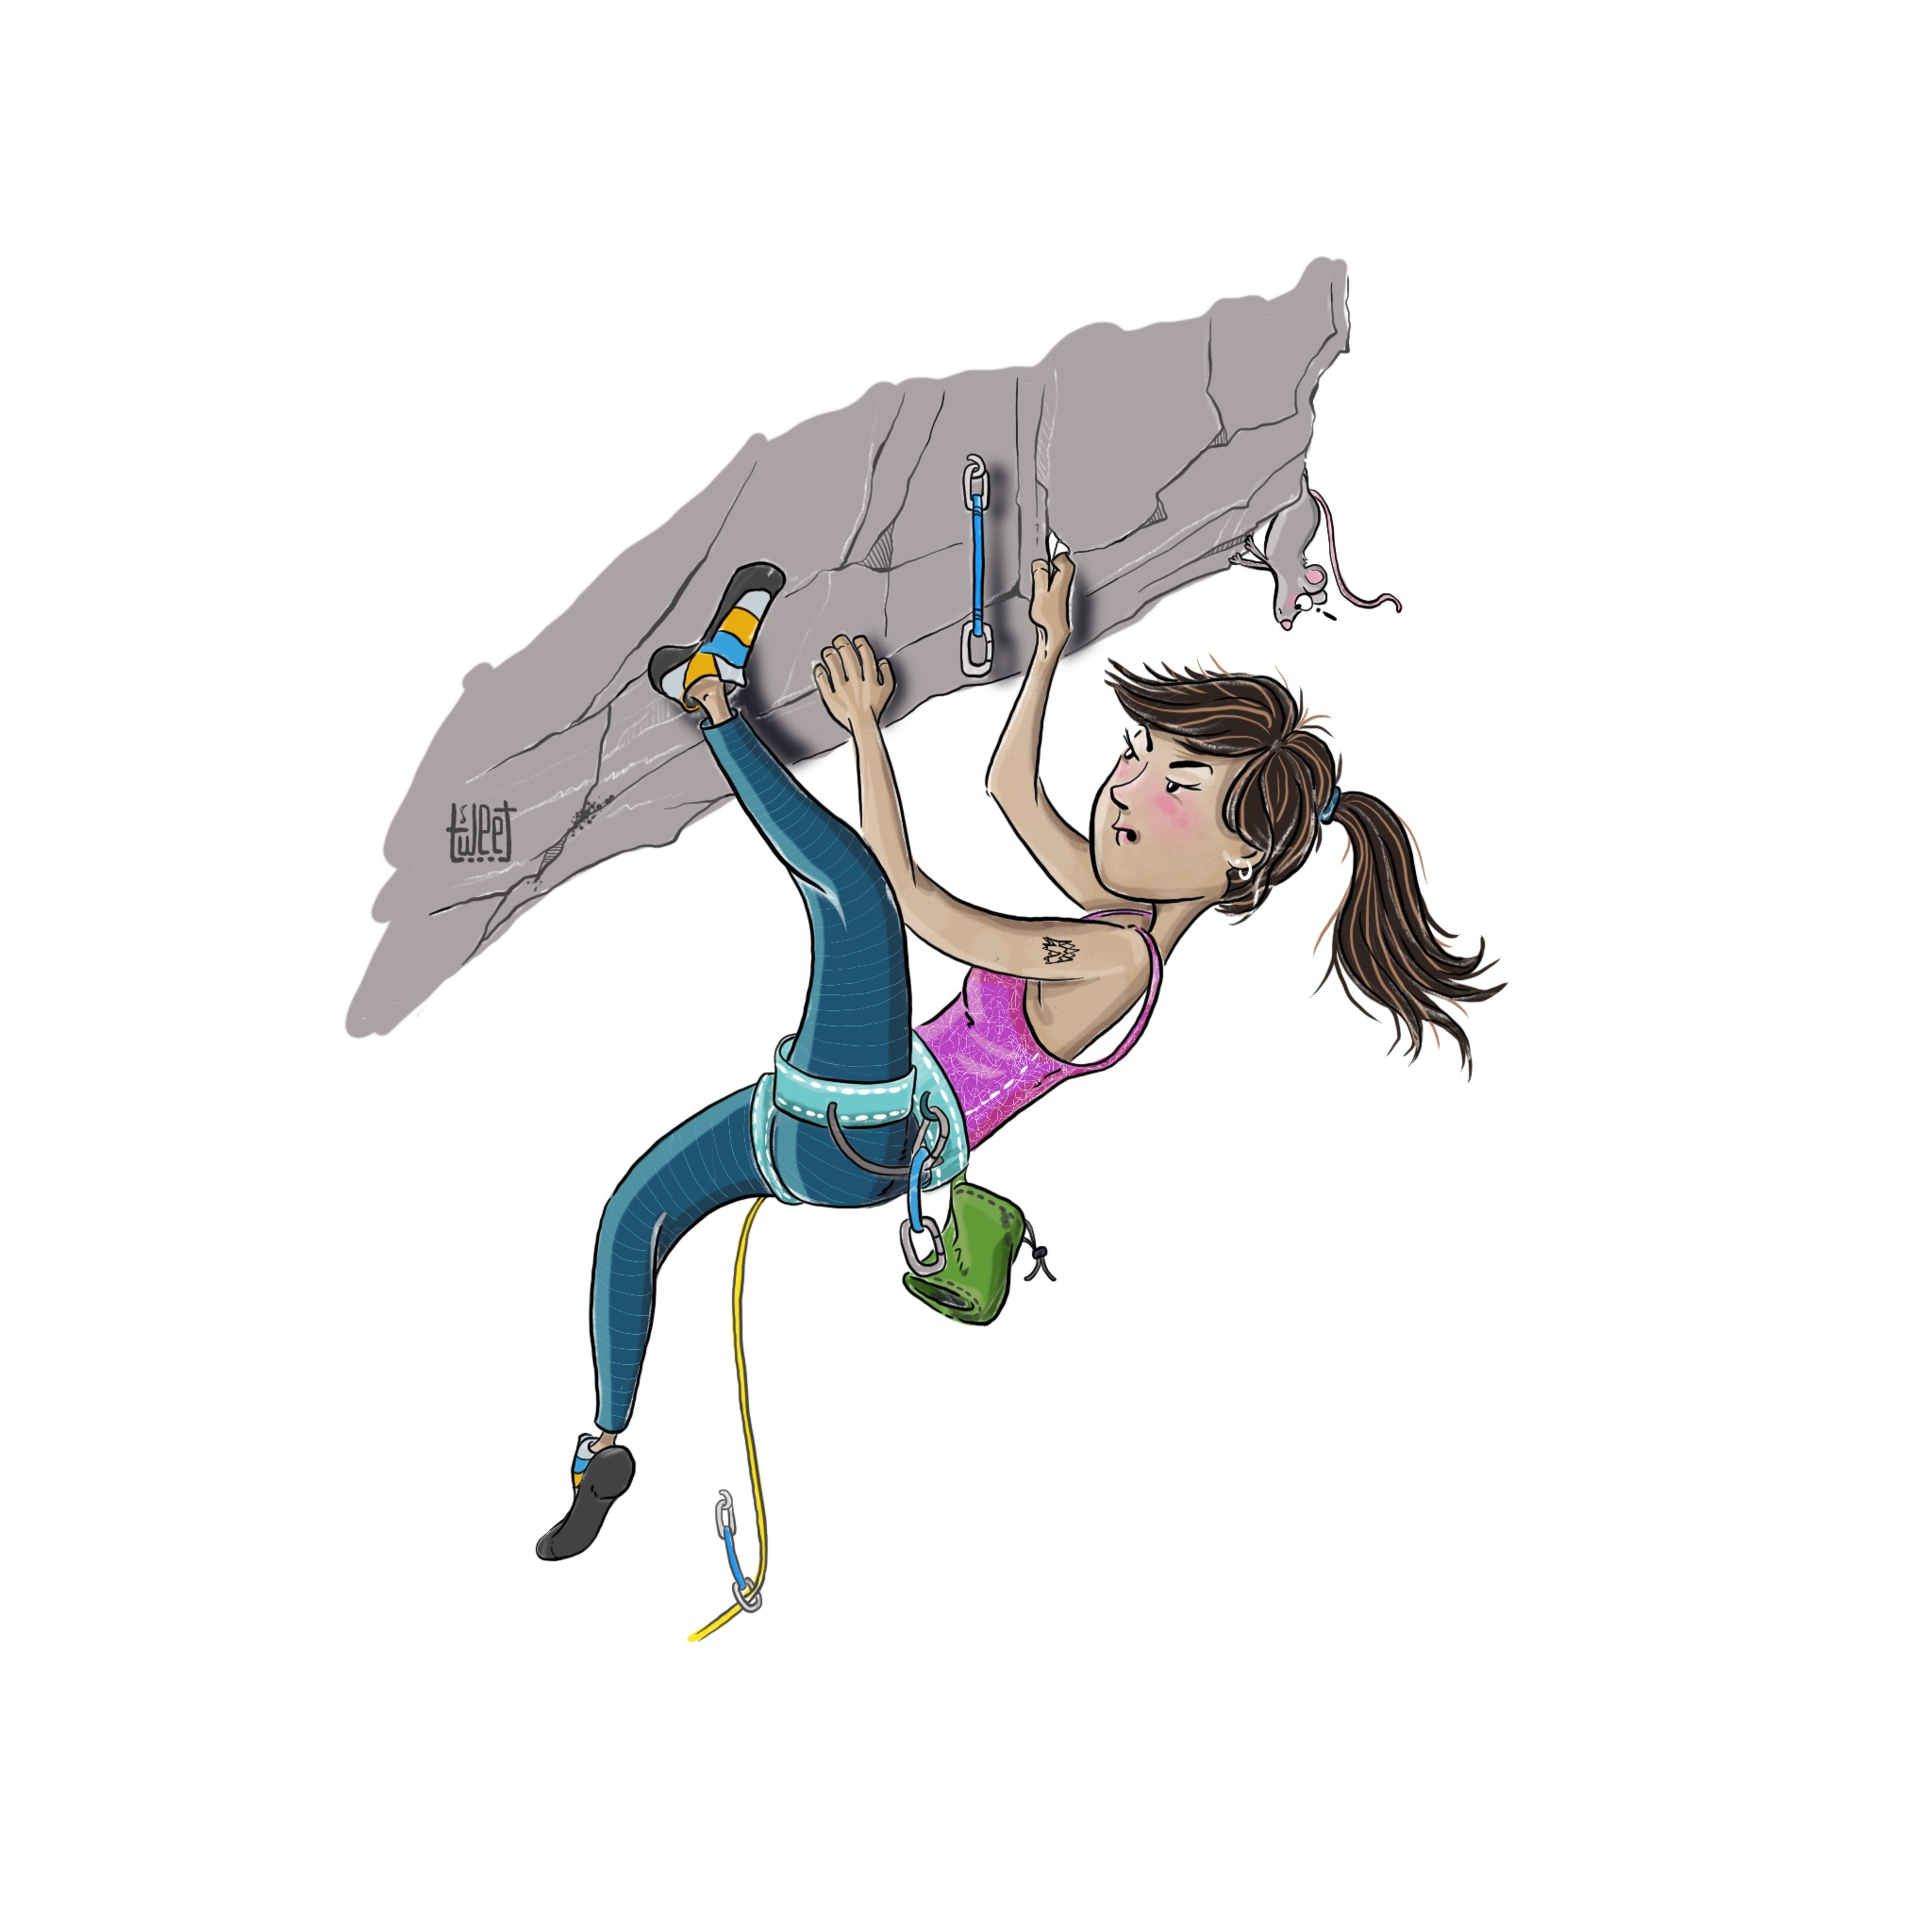 Colored Illustrations - Heel Hook - Rock Climbing